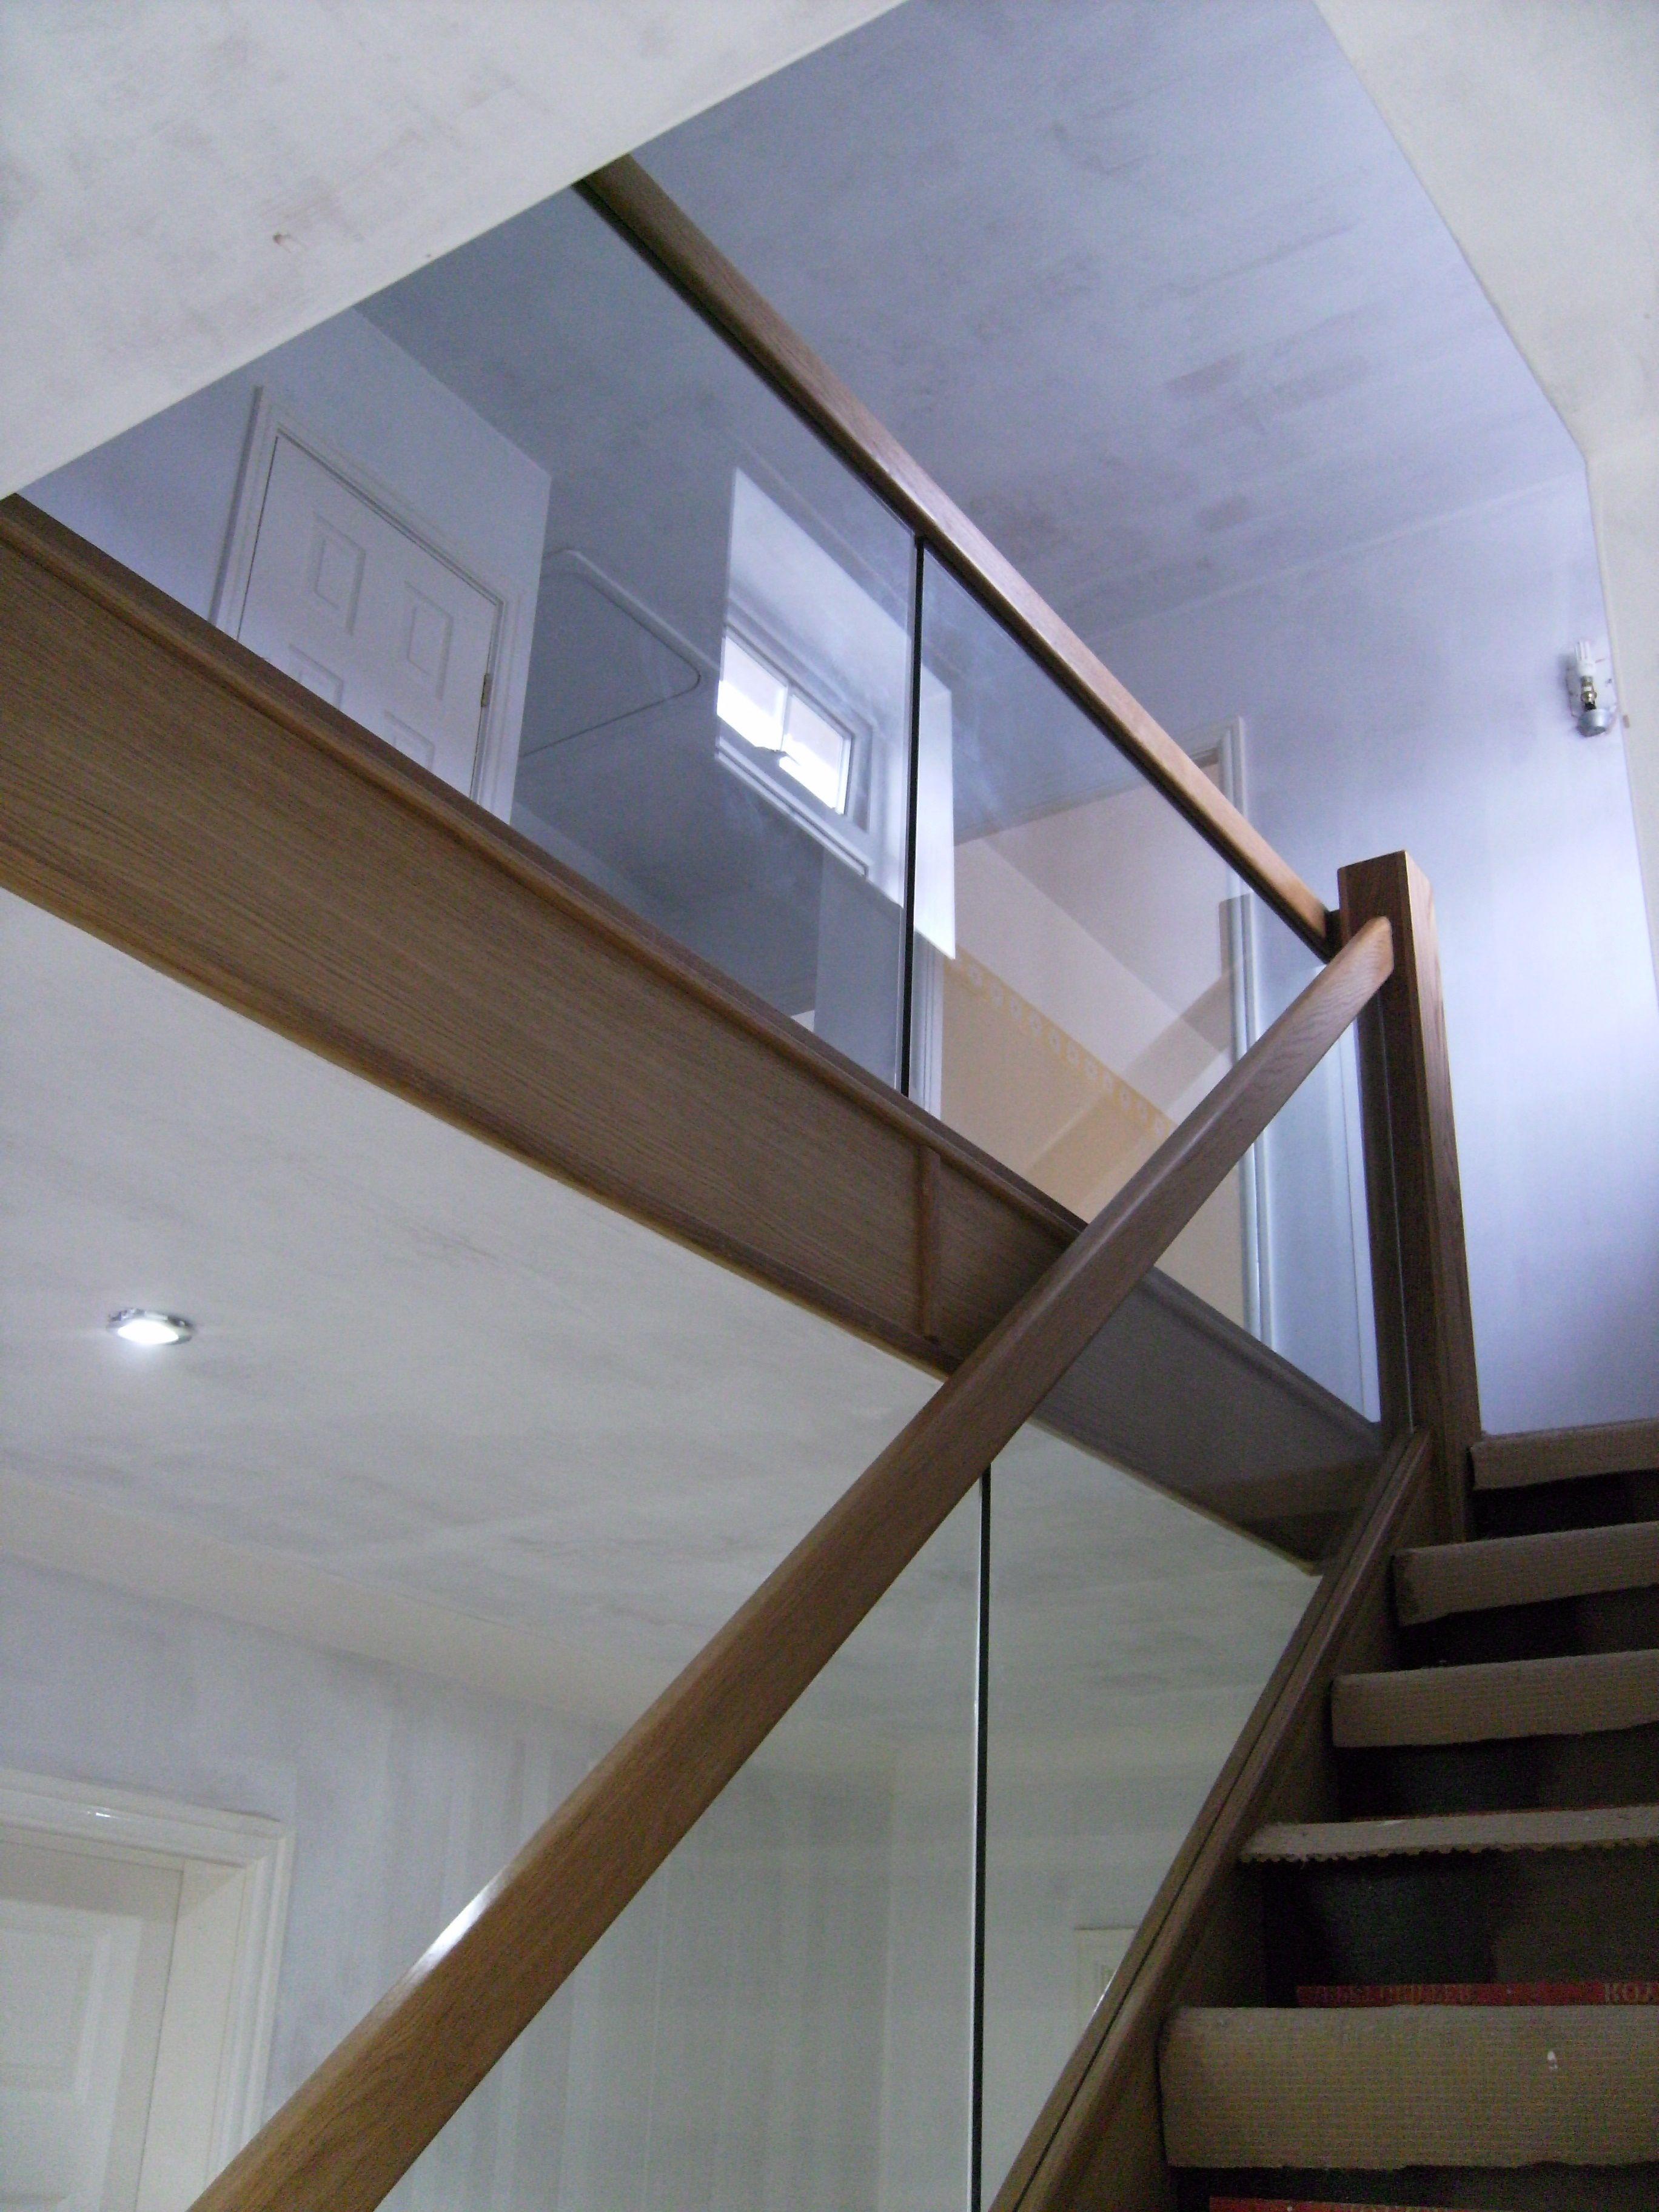 abberford cl oak glass renovation image 4 B